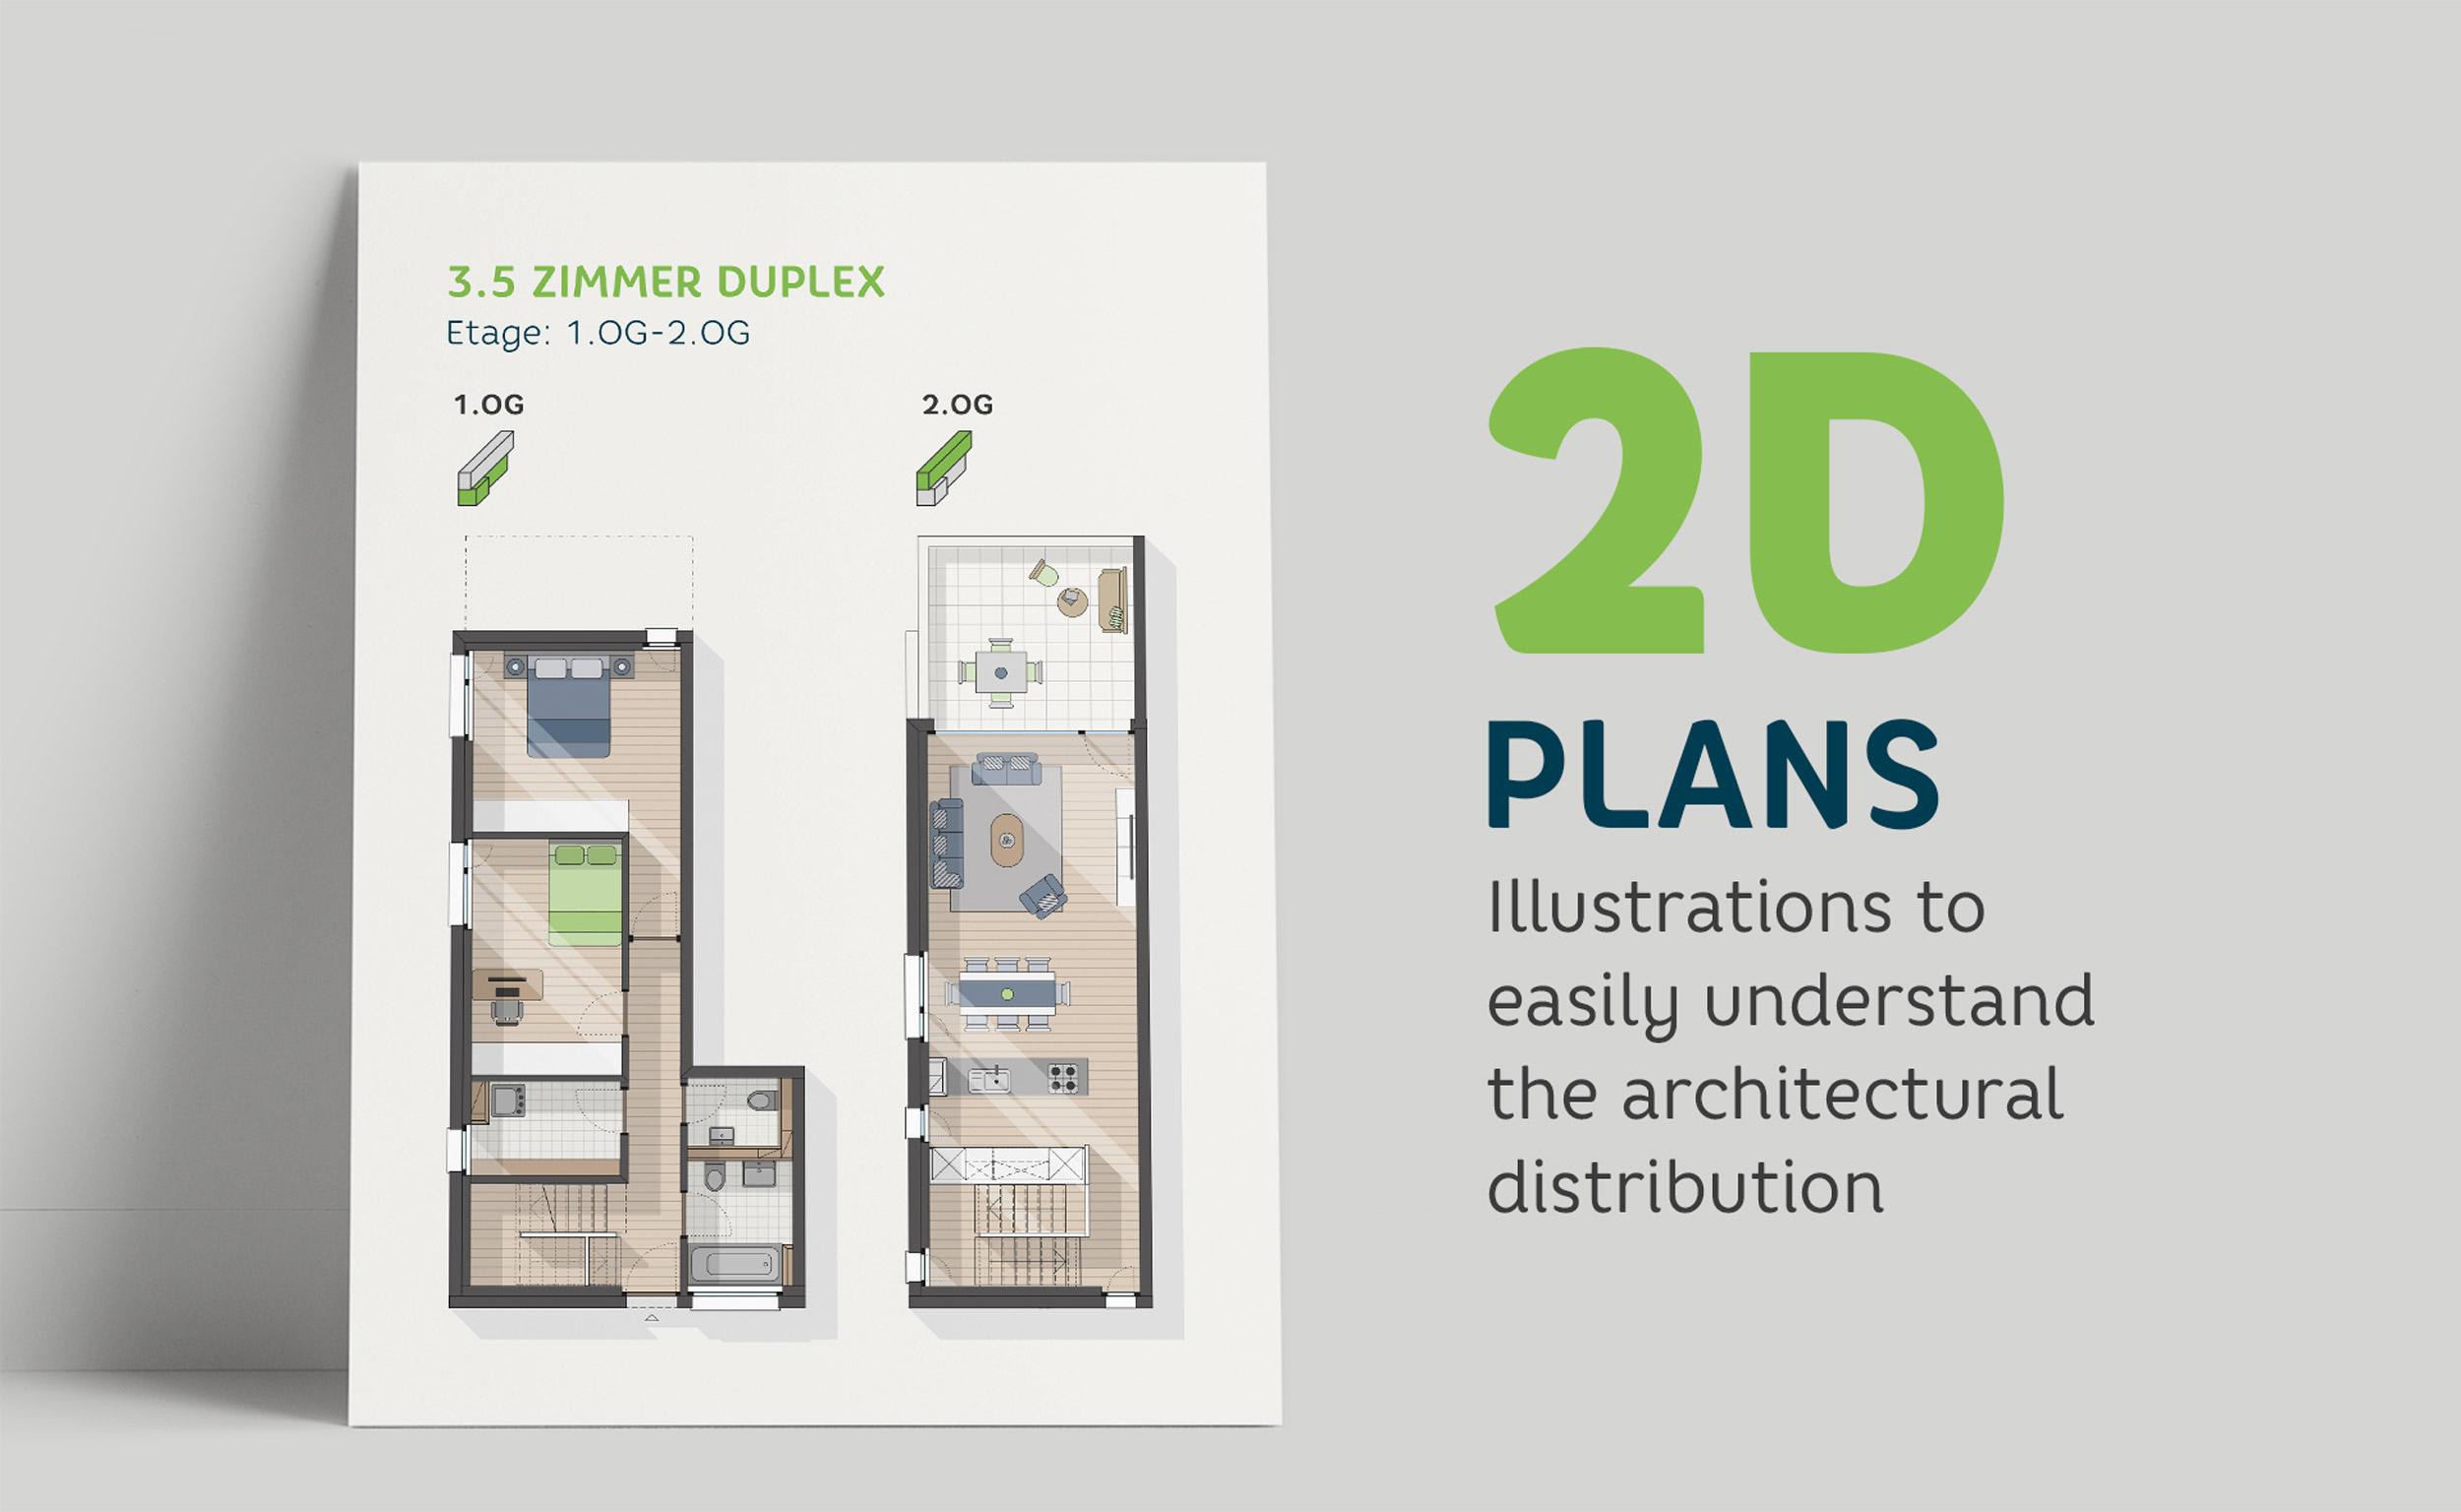 Vechigen Höfe 2D plans by GPU Design